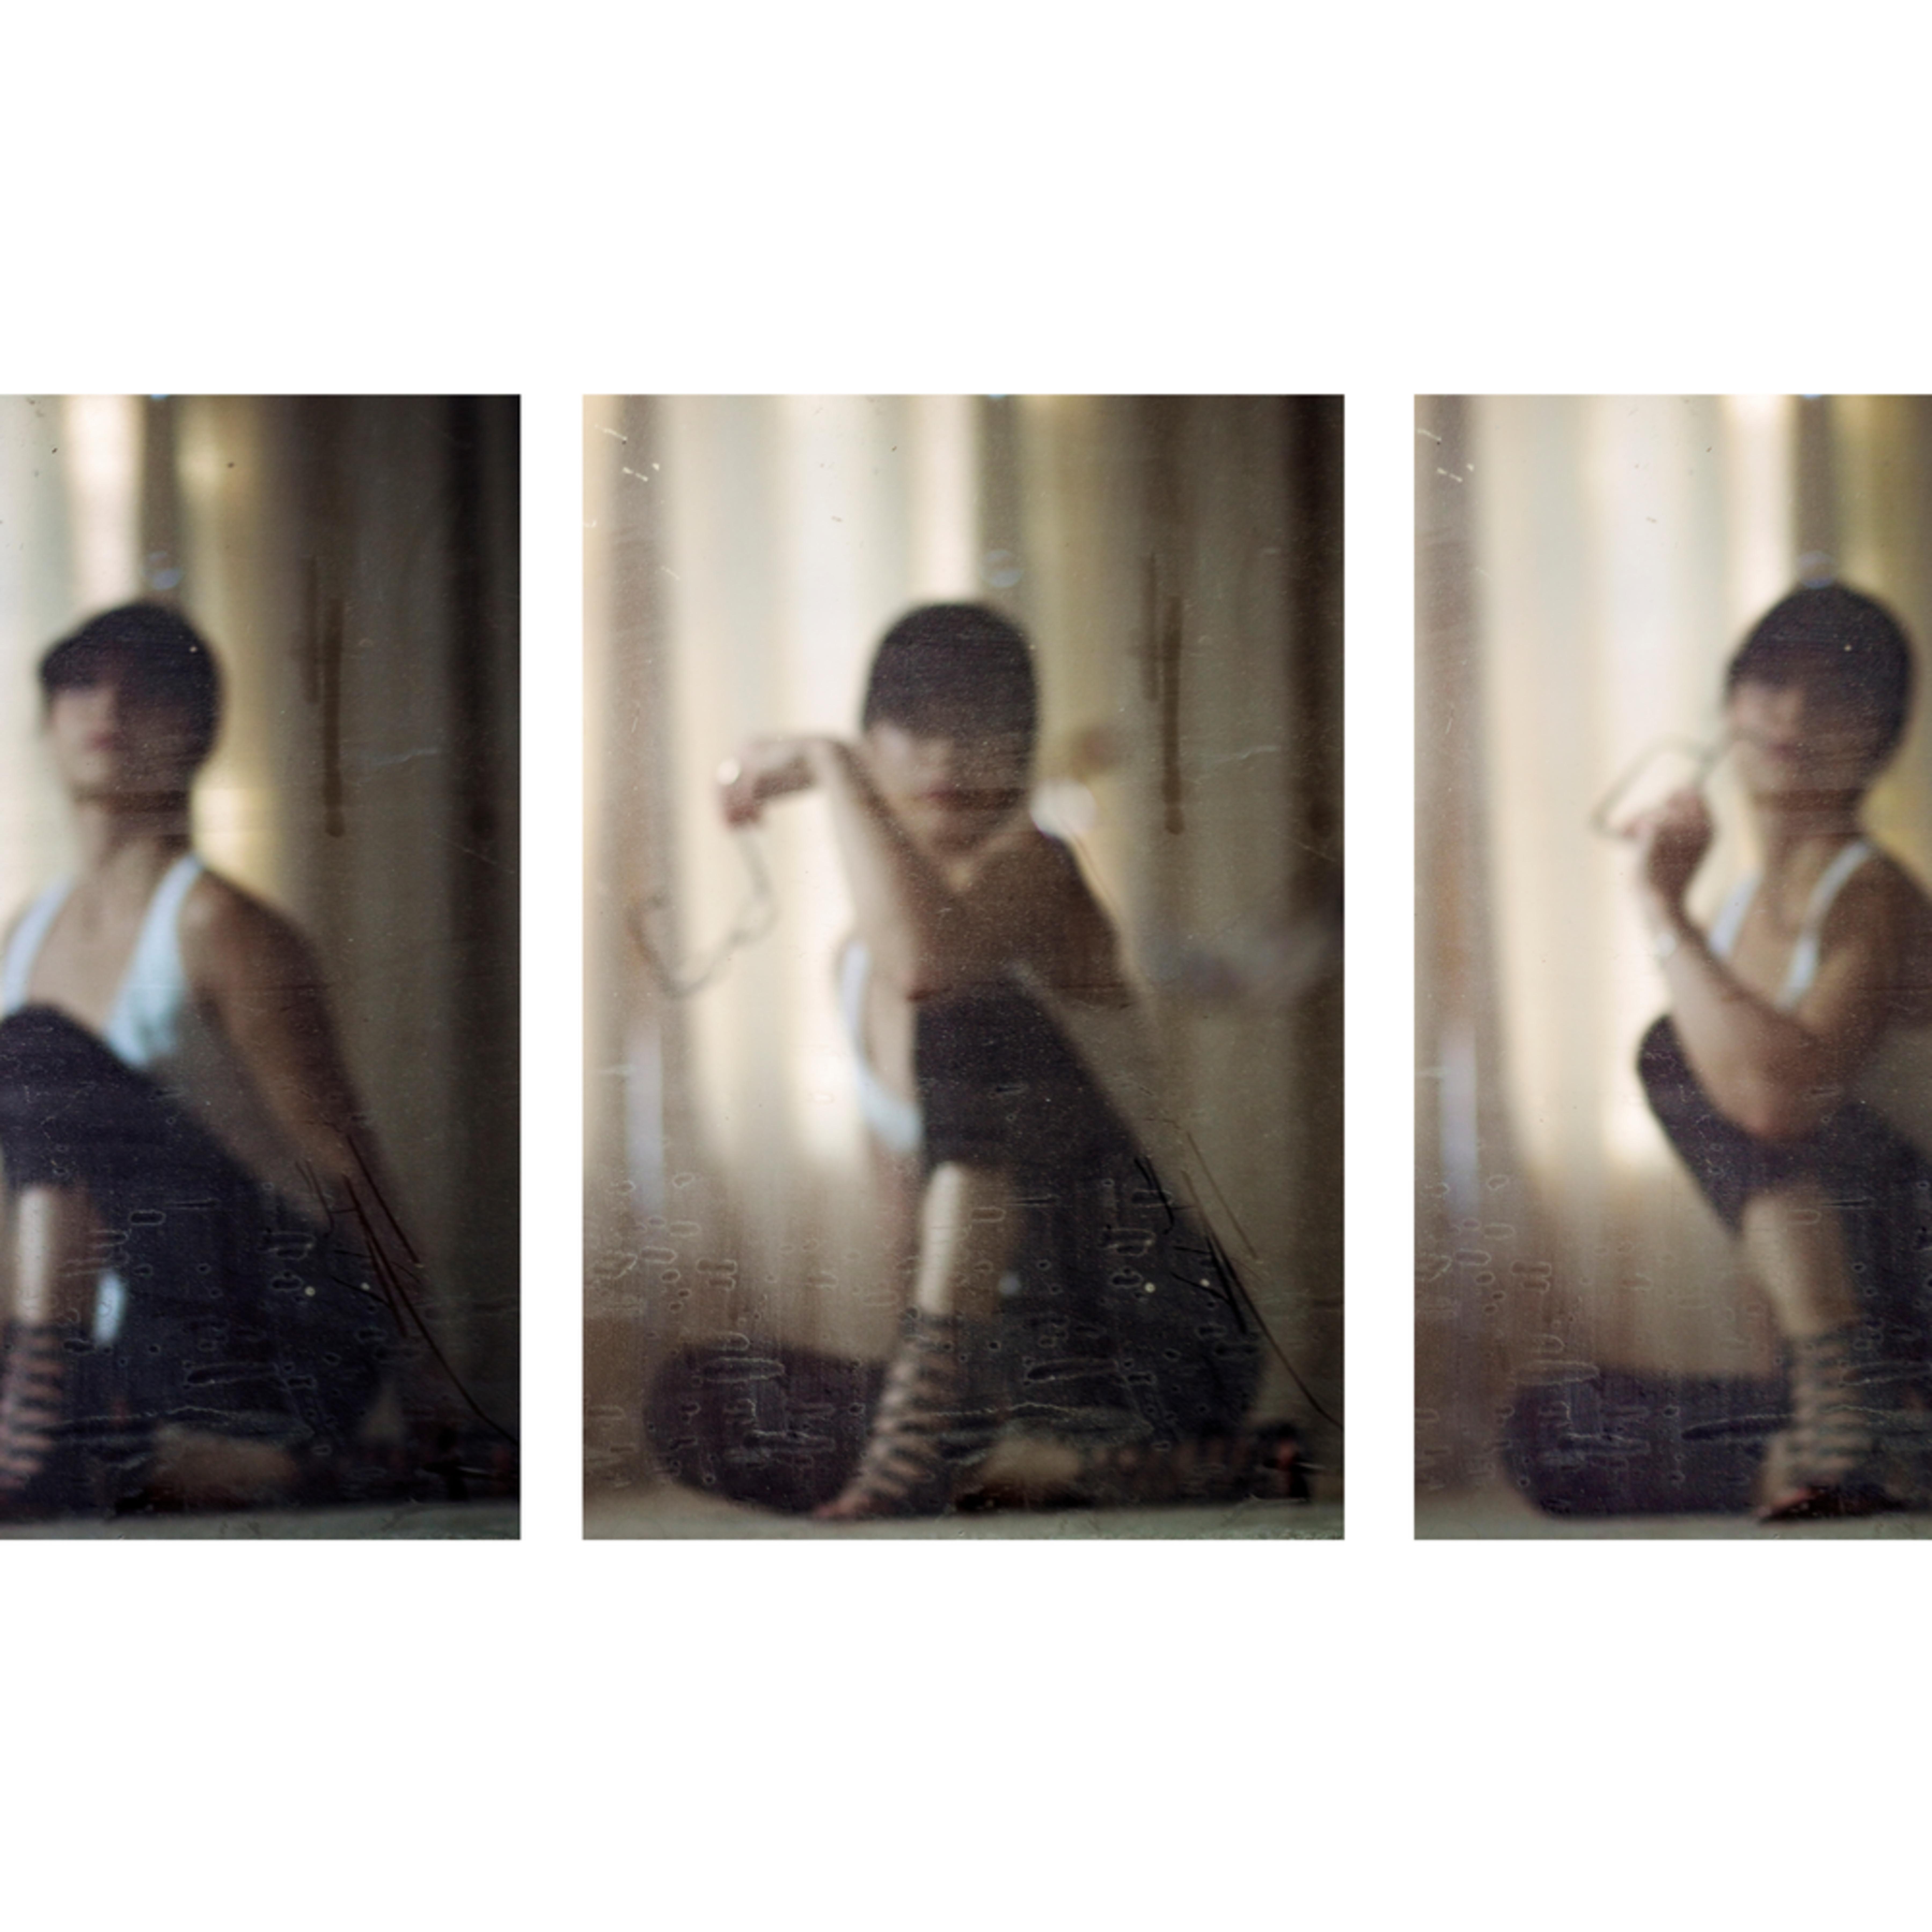 Anonymity triptych abstract portrait photography fine art print silvia nikolov fy6uss